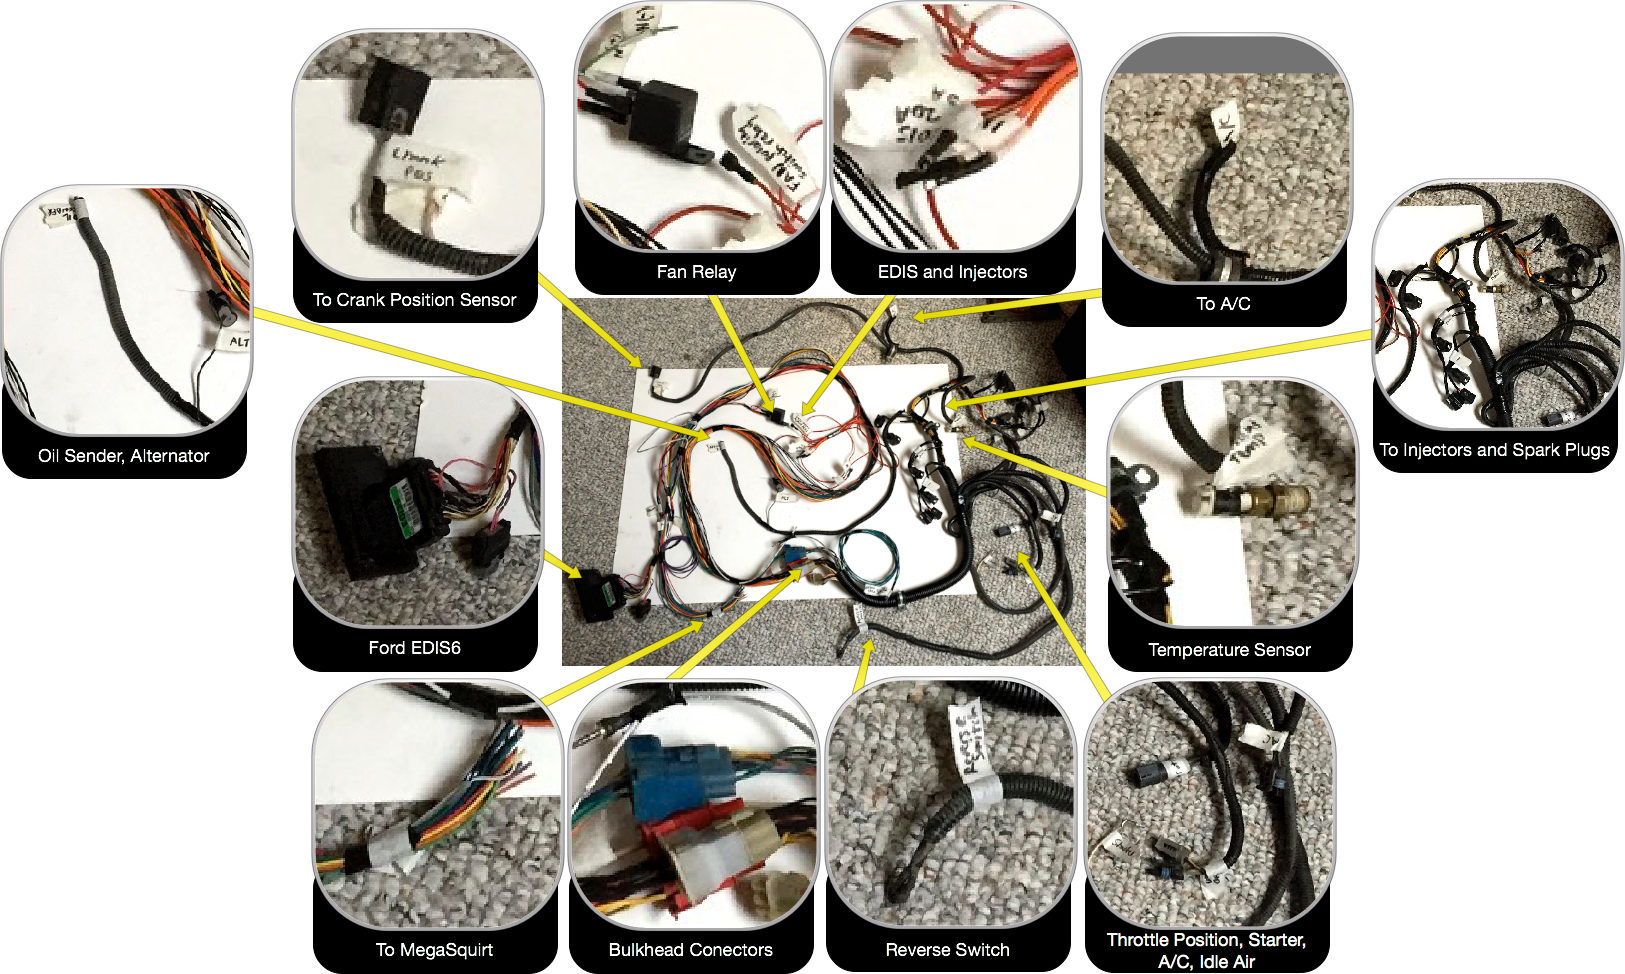 Josh's 3.0L EFI wiring harness with EDIS6 ignition control.